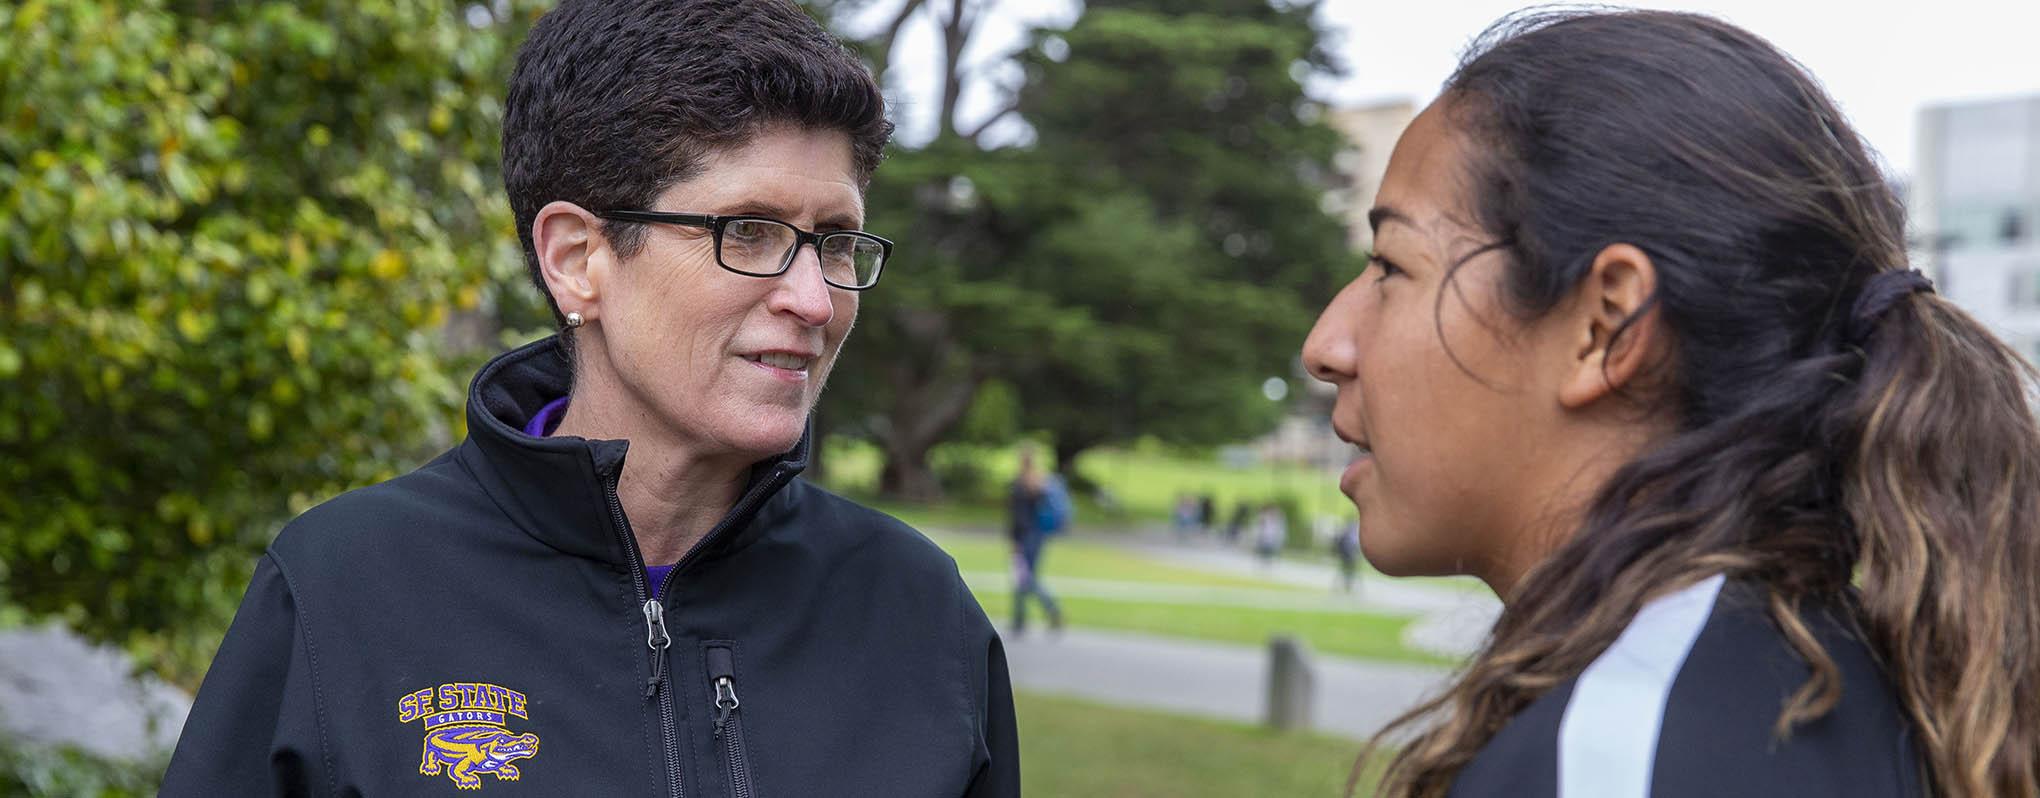 President Mahoney speaks with student